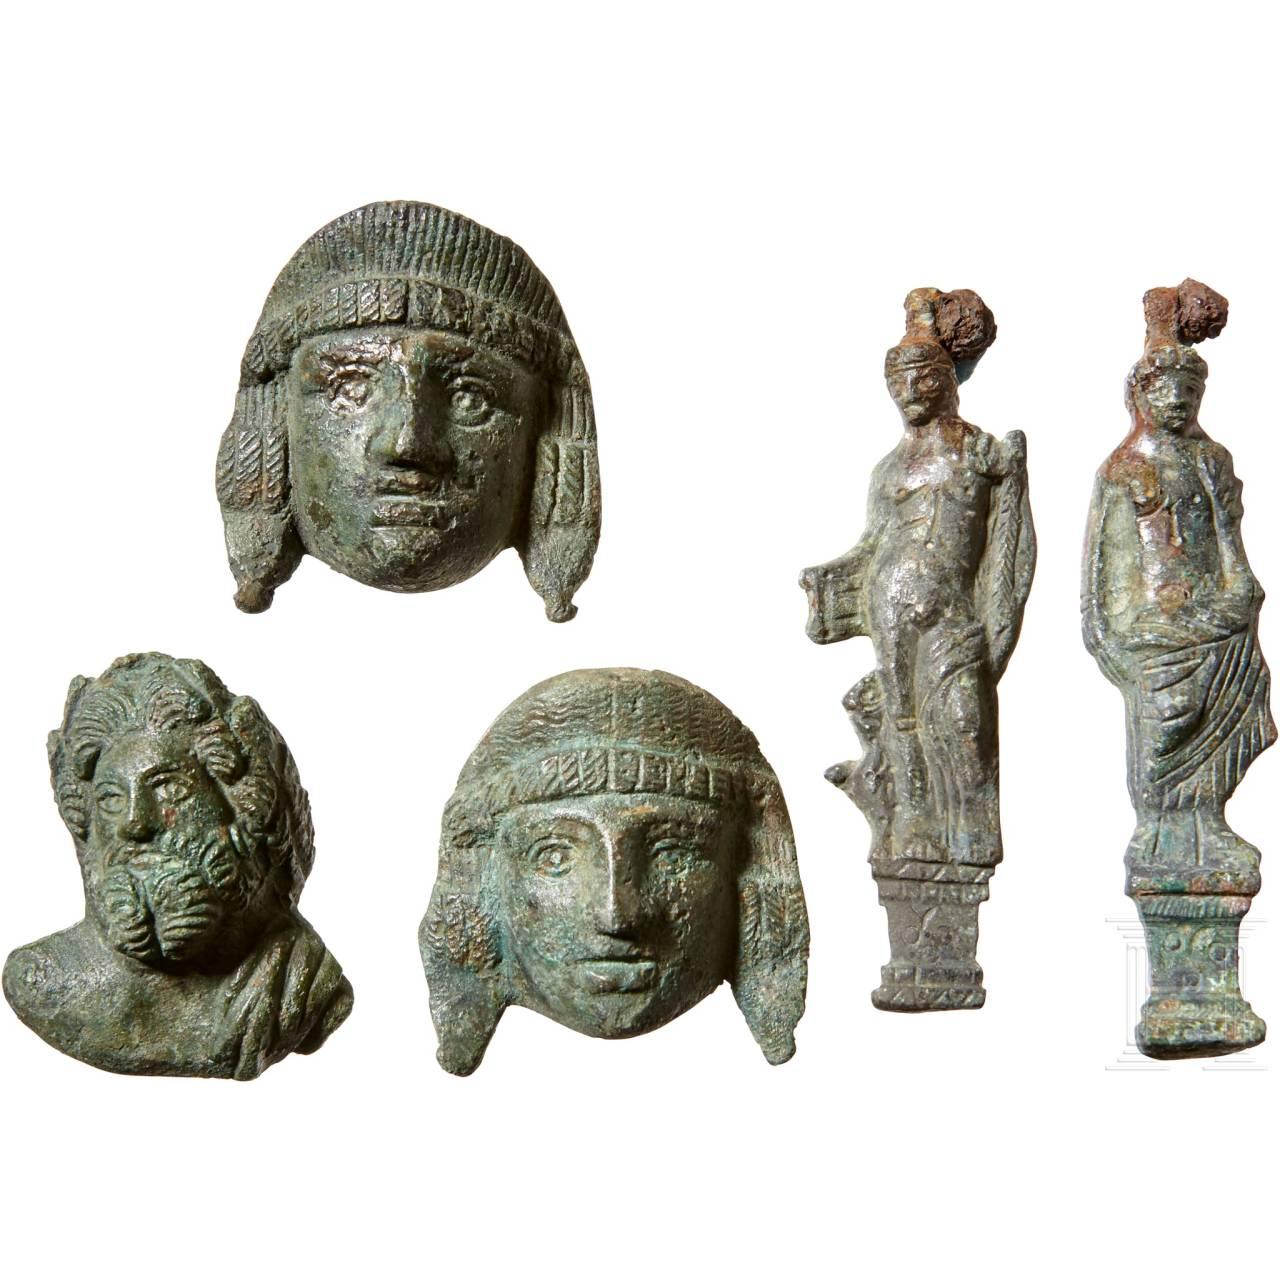 Five Roman figurative fittings, 2nd – 3rd century